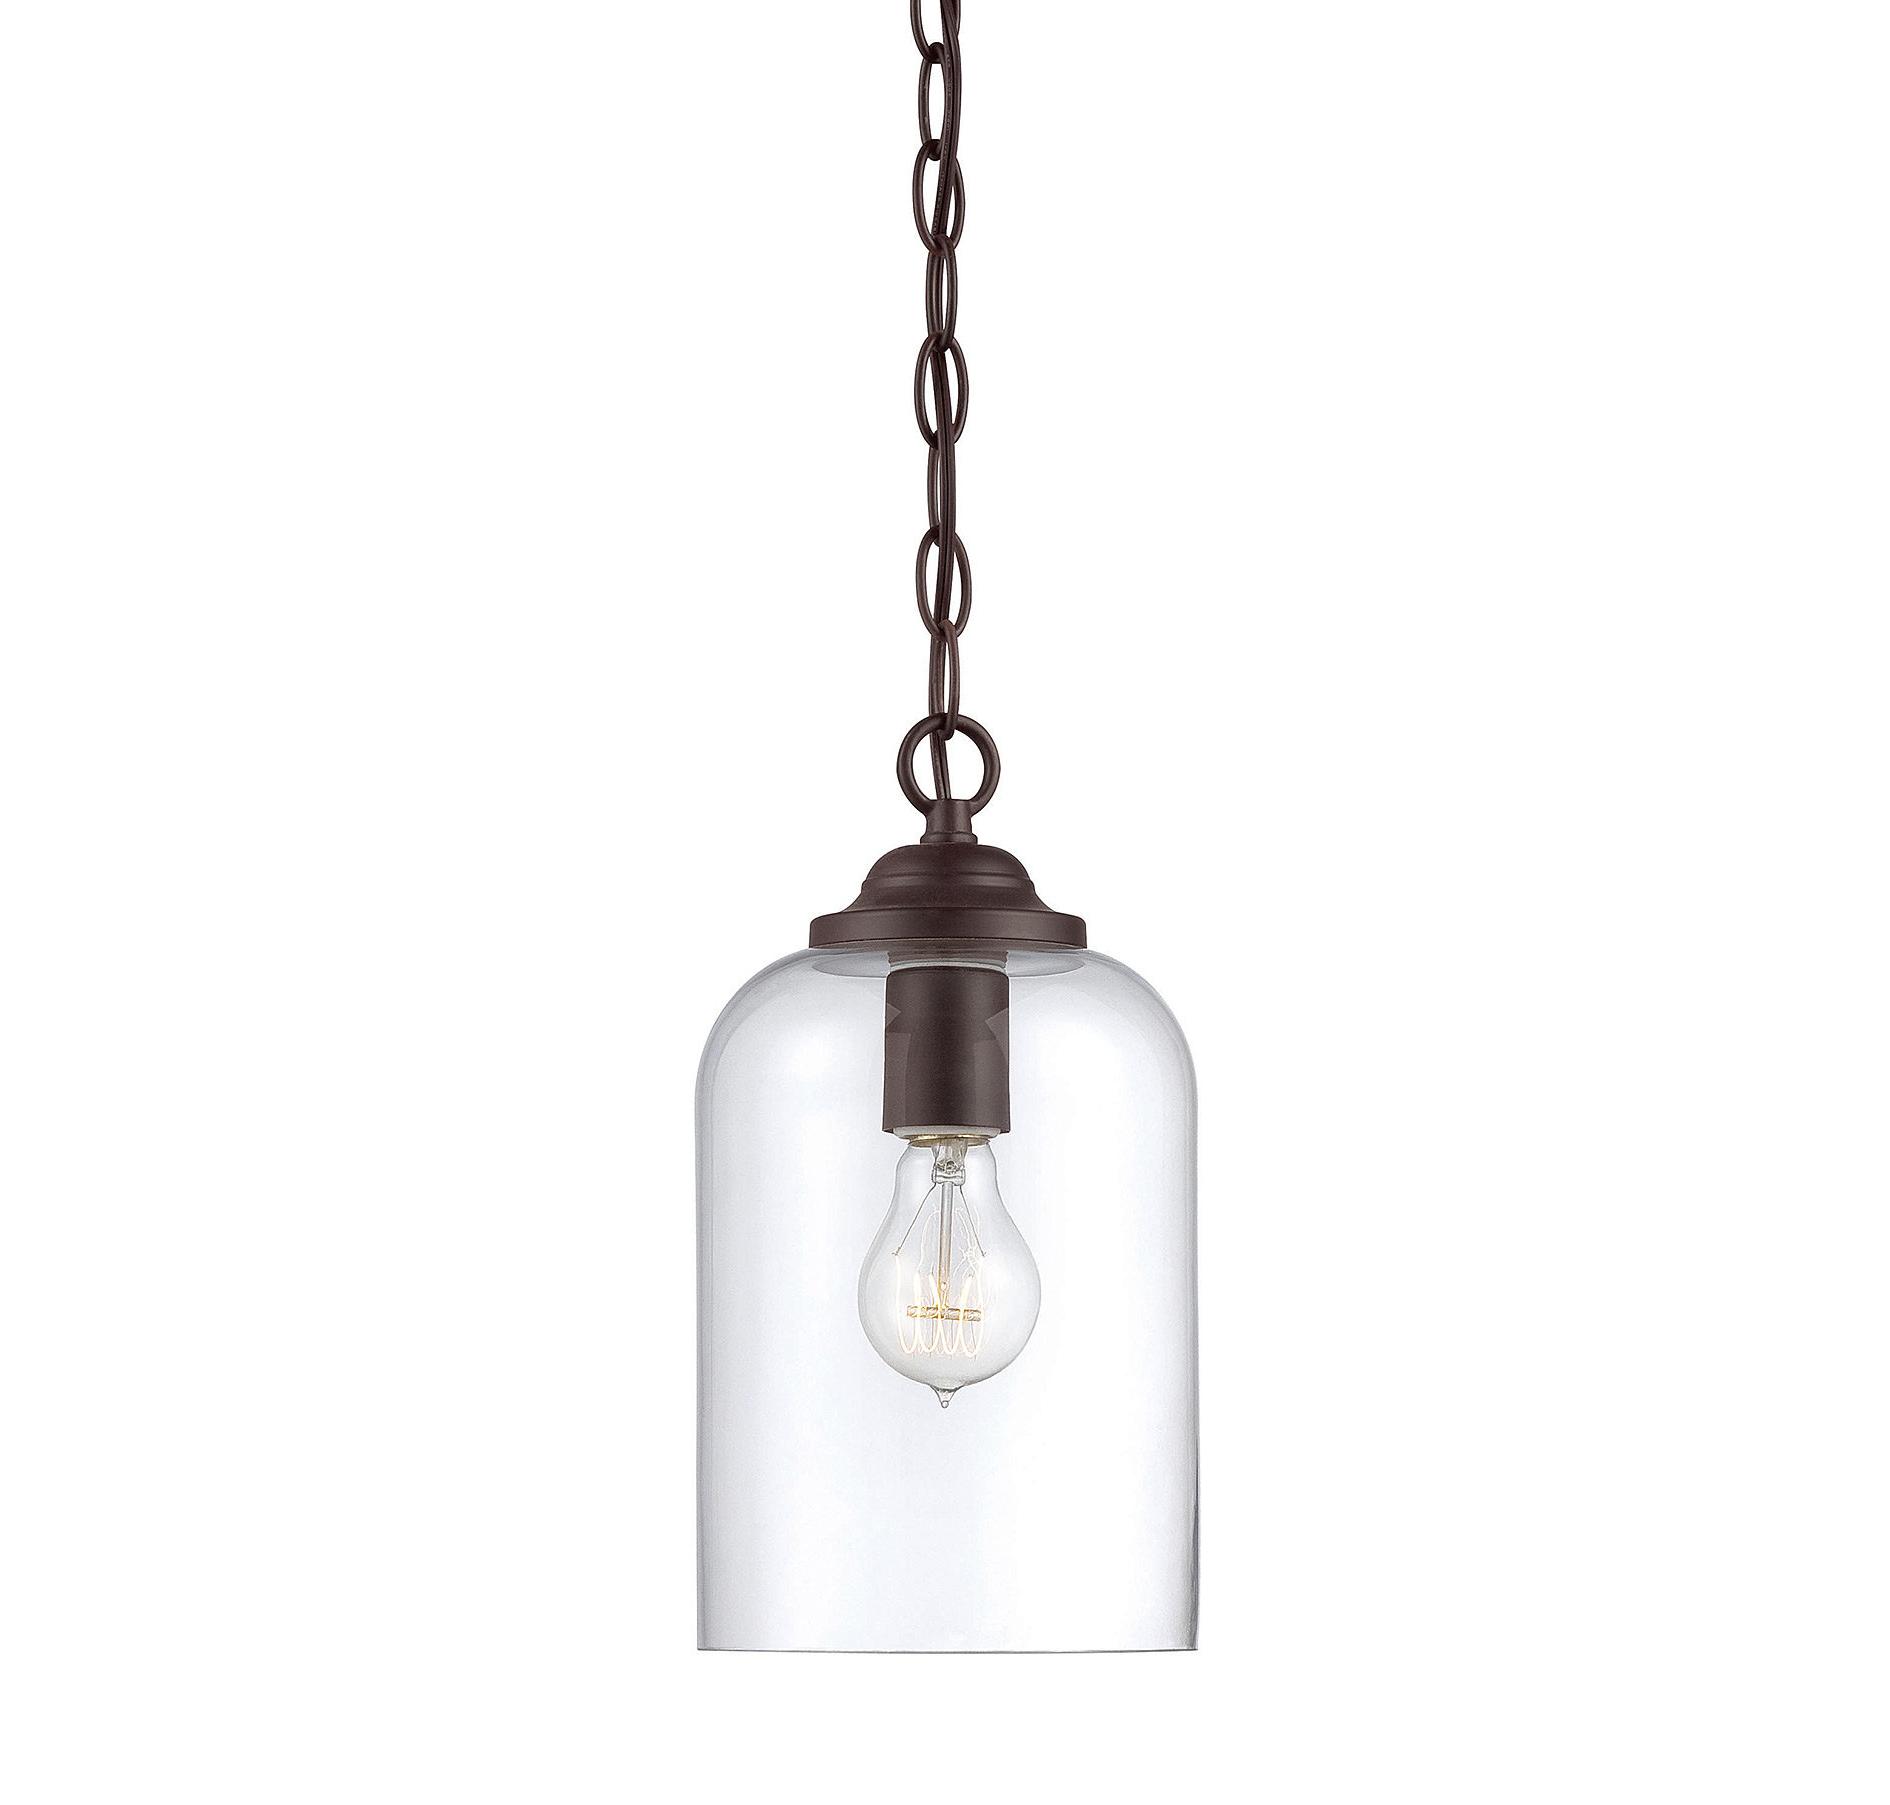 Popular Silber 1 Light Single Bell Pendant Throughout Nolan 1 Light Single Cylinder Pendants (View 14 of 25)